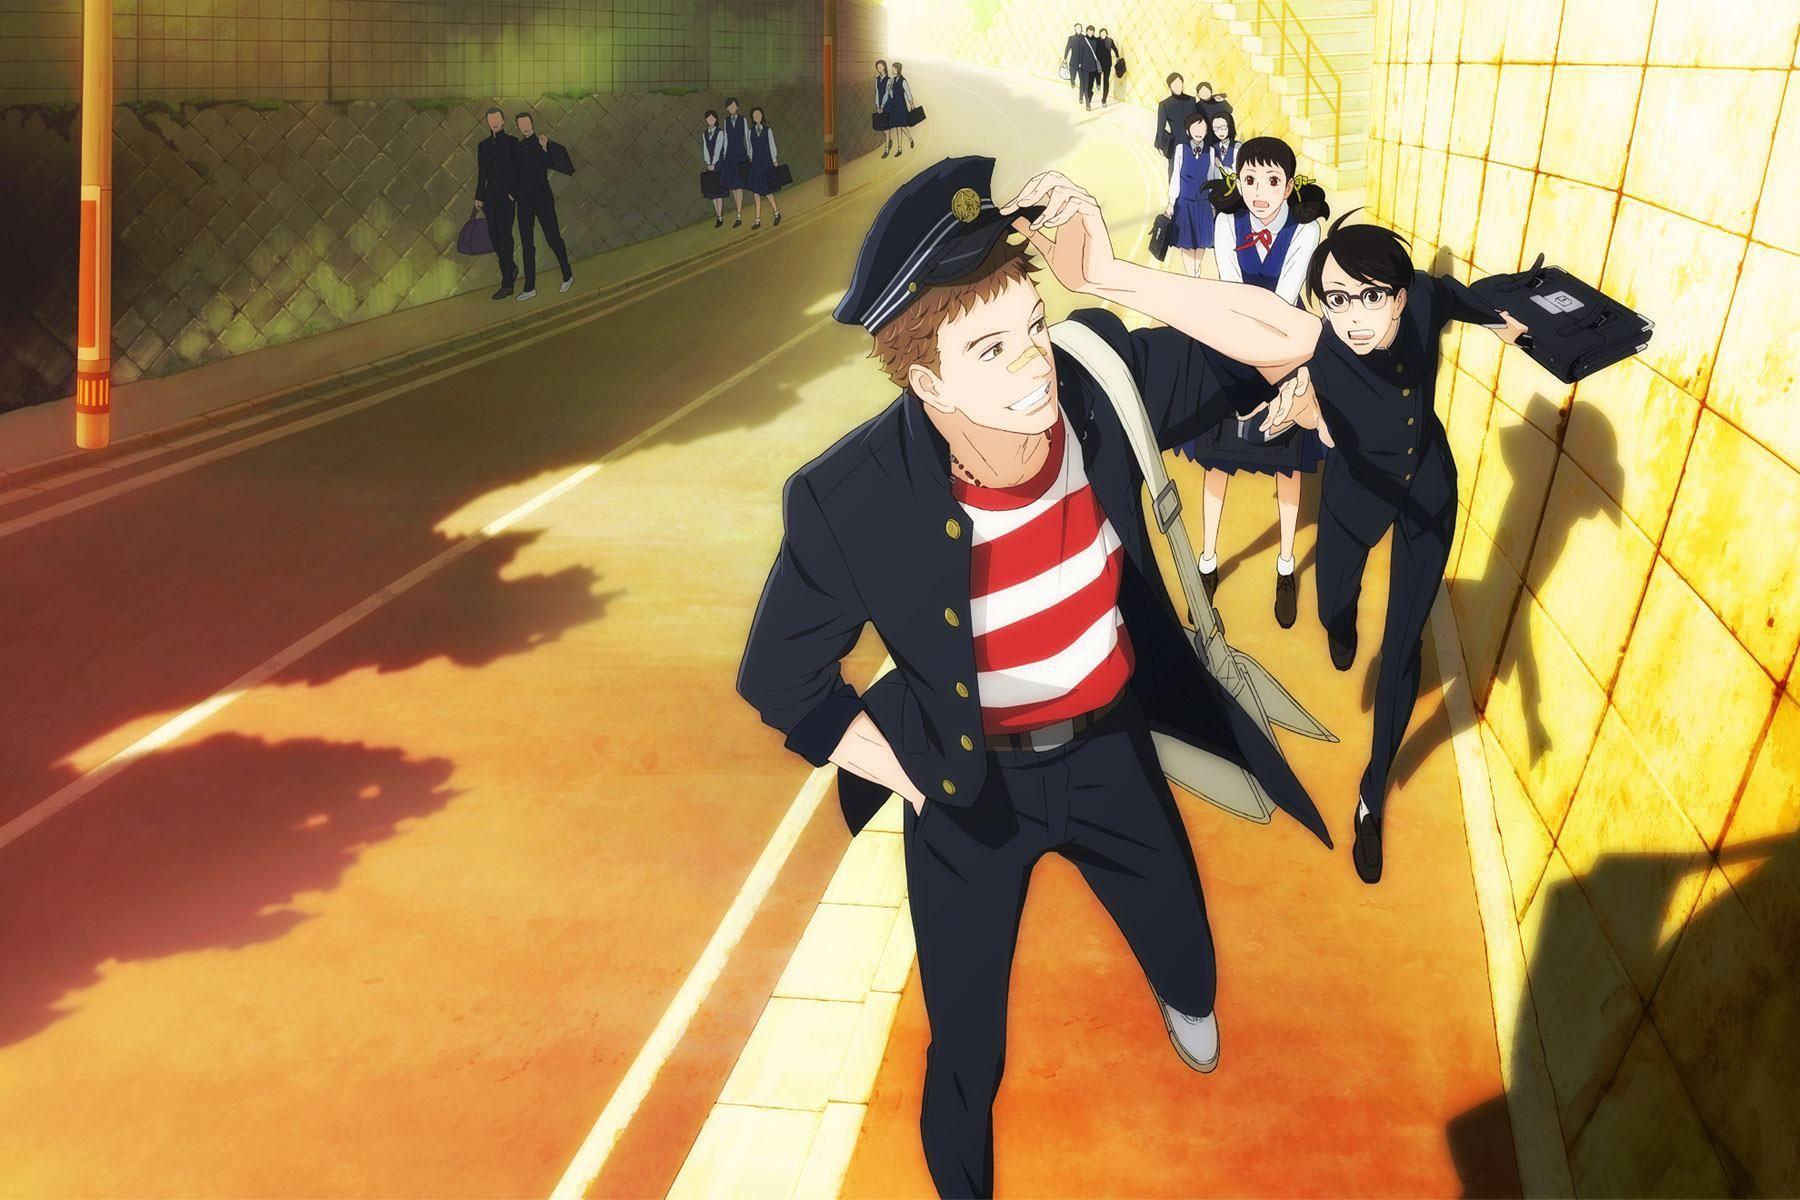 Sakamichi no Apollon Top 10 romance anime, Anime romance